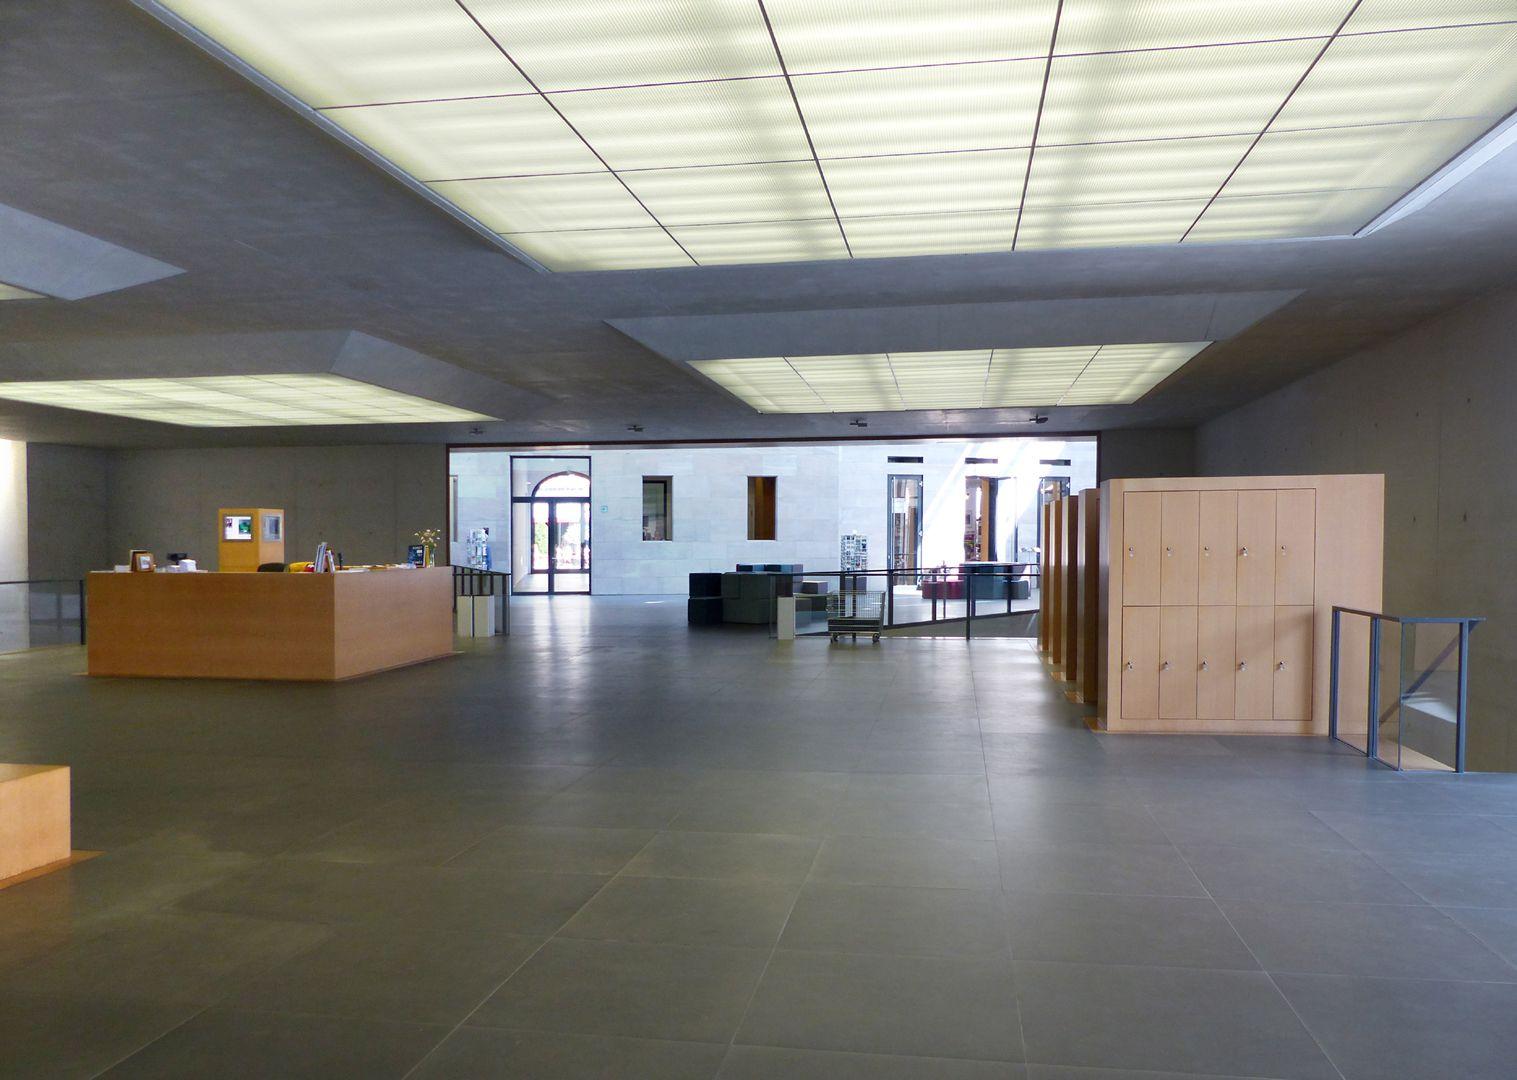 Neues Museum Foyer